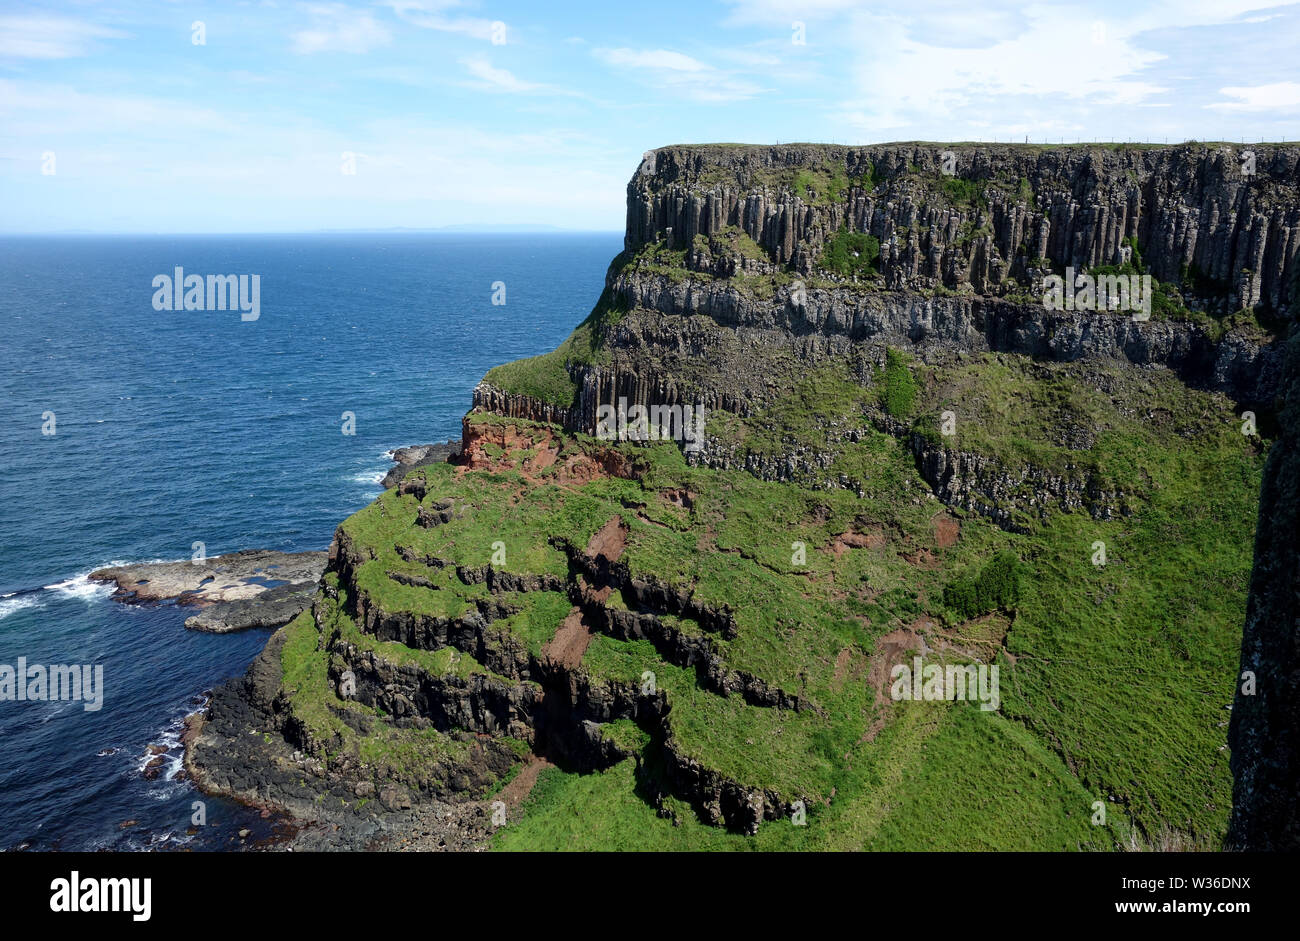 The Western Cliffs of Benbane Head on the Giant's Causeway Coastal Path, County Antrim, Northern Ireland, UK Stock Photo